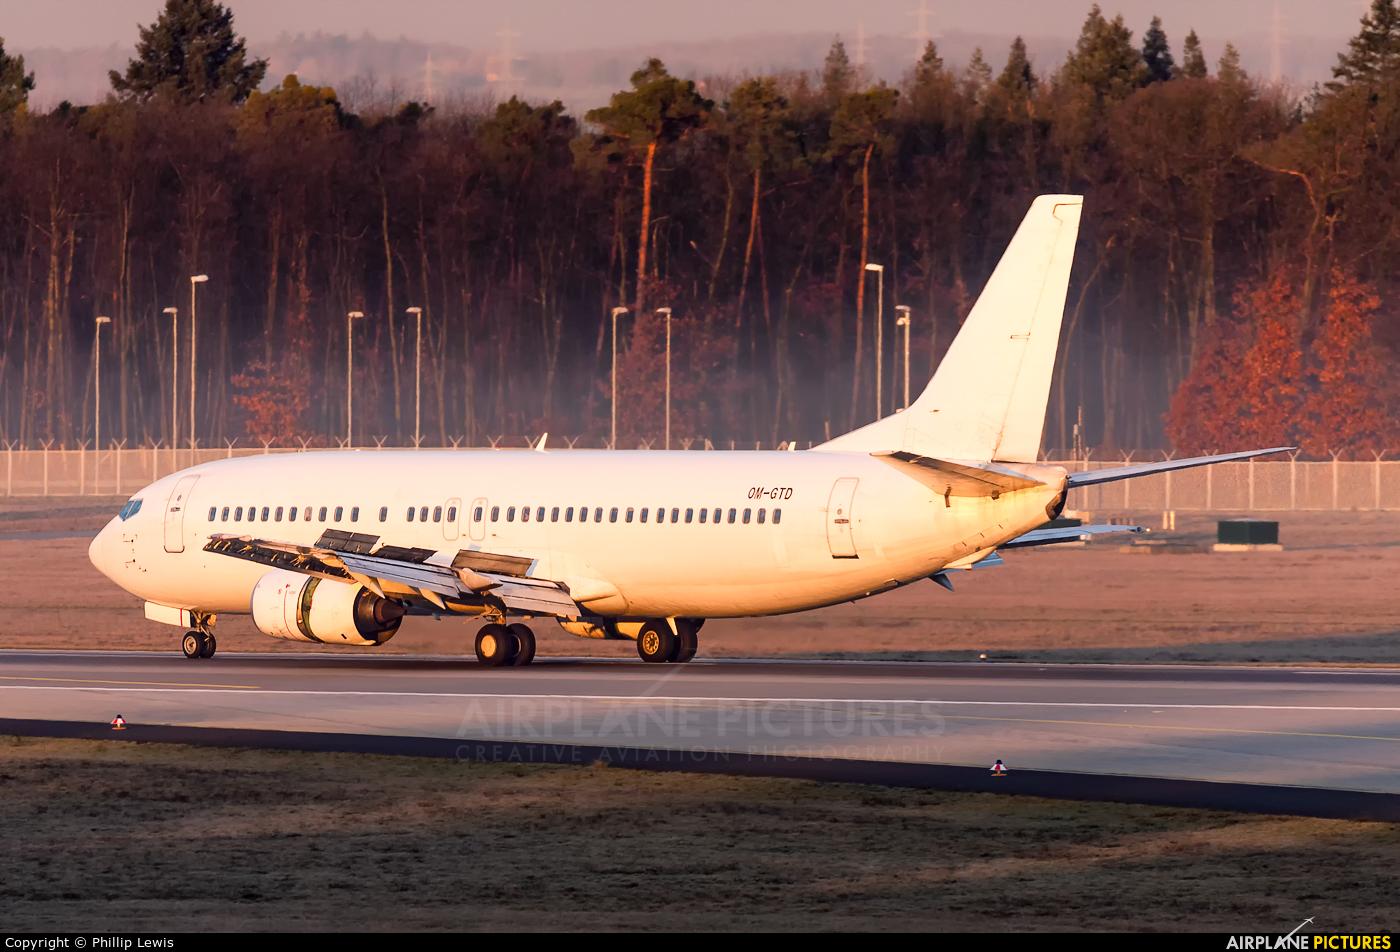 Go2Sky Airline OM-GTD aircraft at Frankfurt